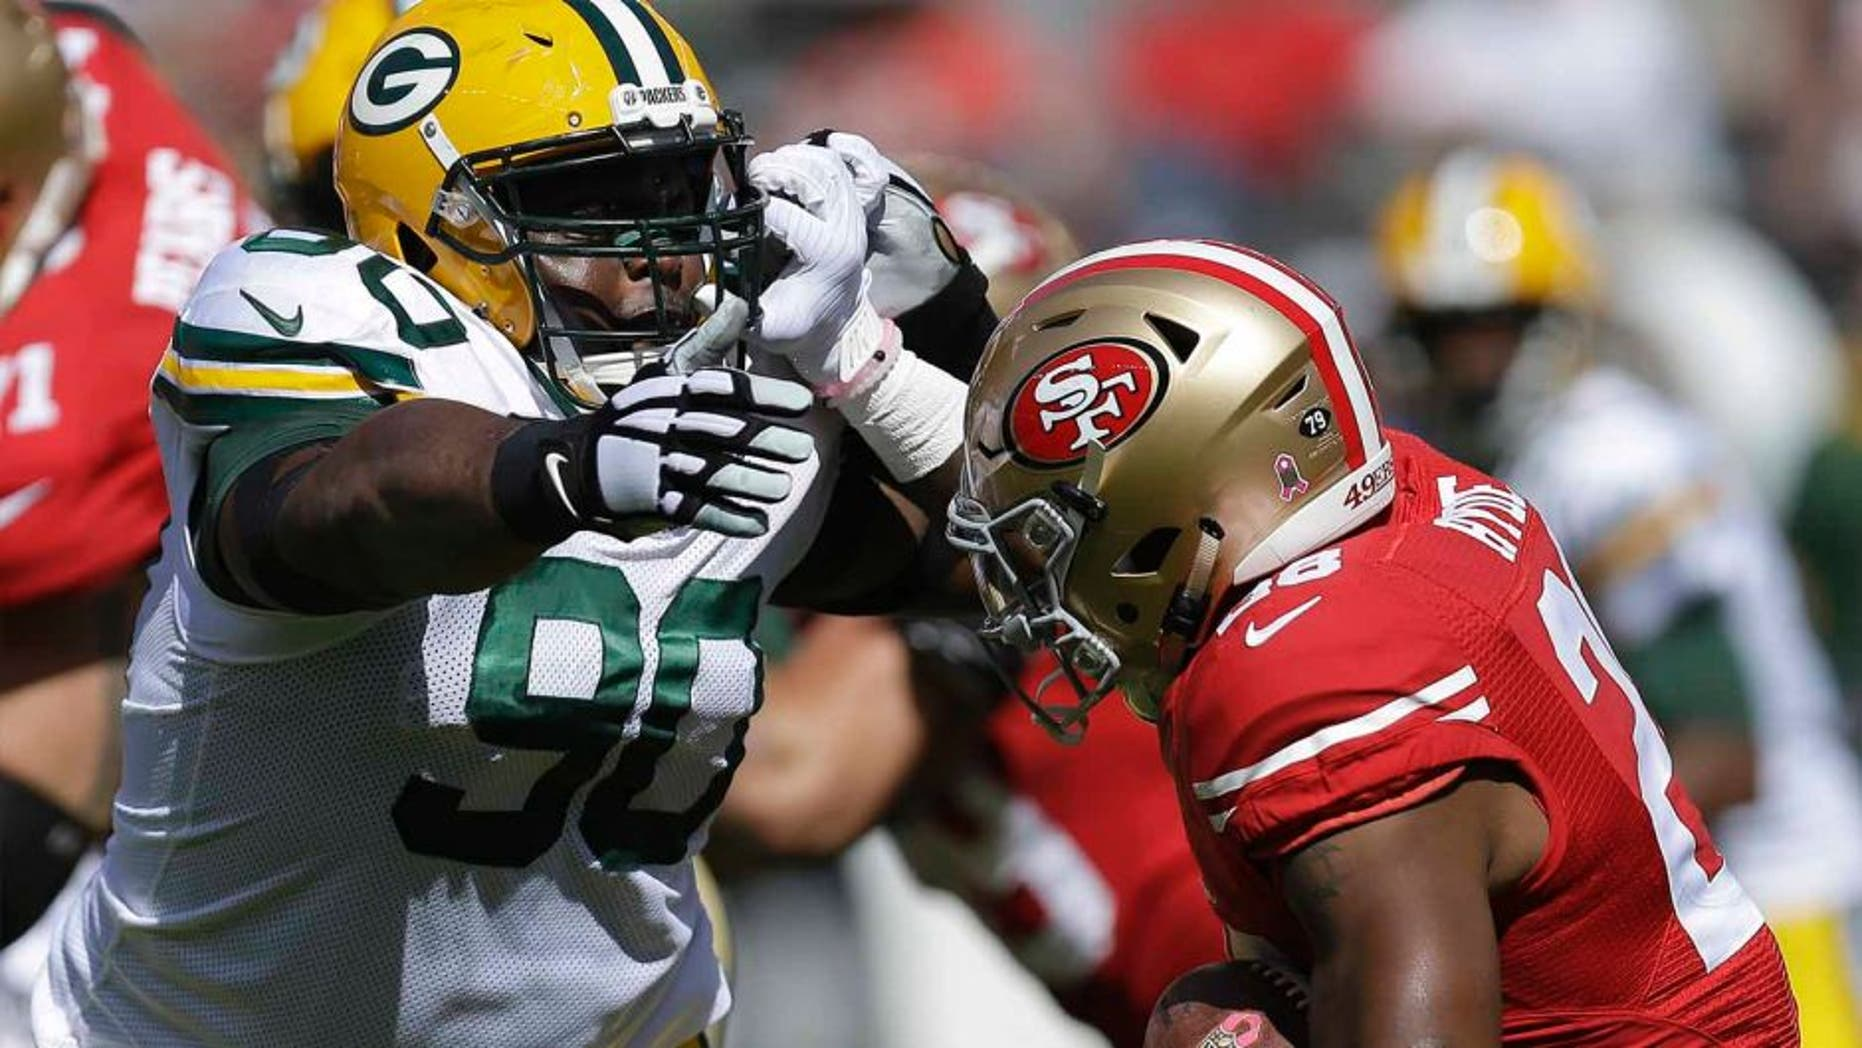 San Francisco 49ers running back Carlos Hyde (right) runs against Green Bay Packers nose tackle B.J. Raji during the first half in Santa Clara, Calif., on Sunday, Oct. 4, 2015.